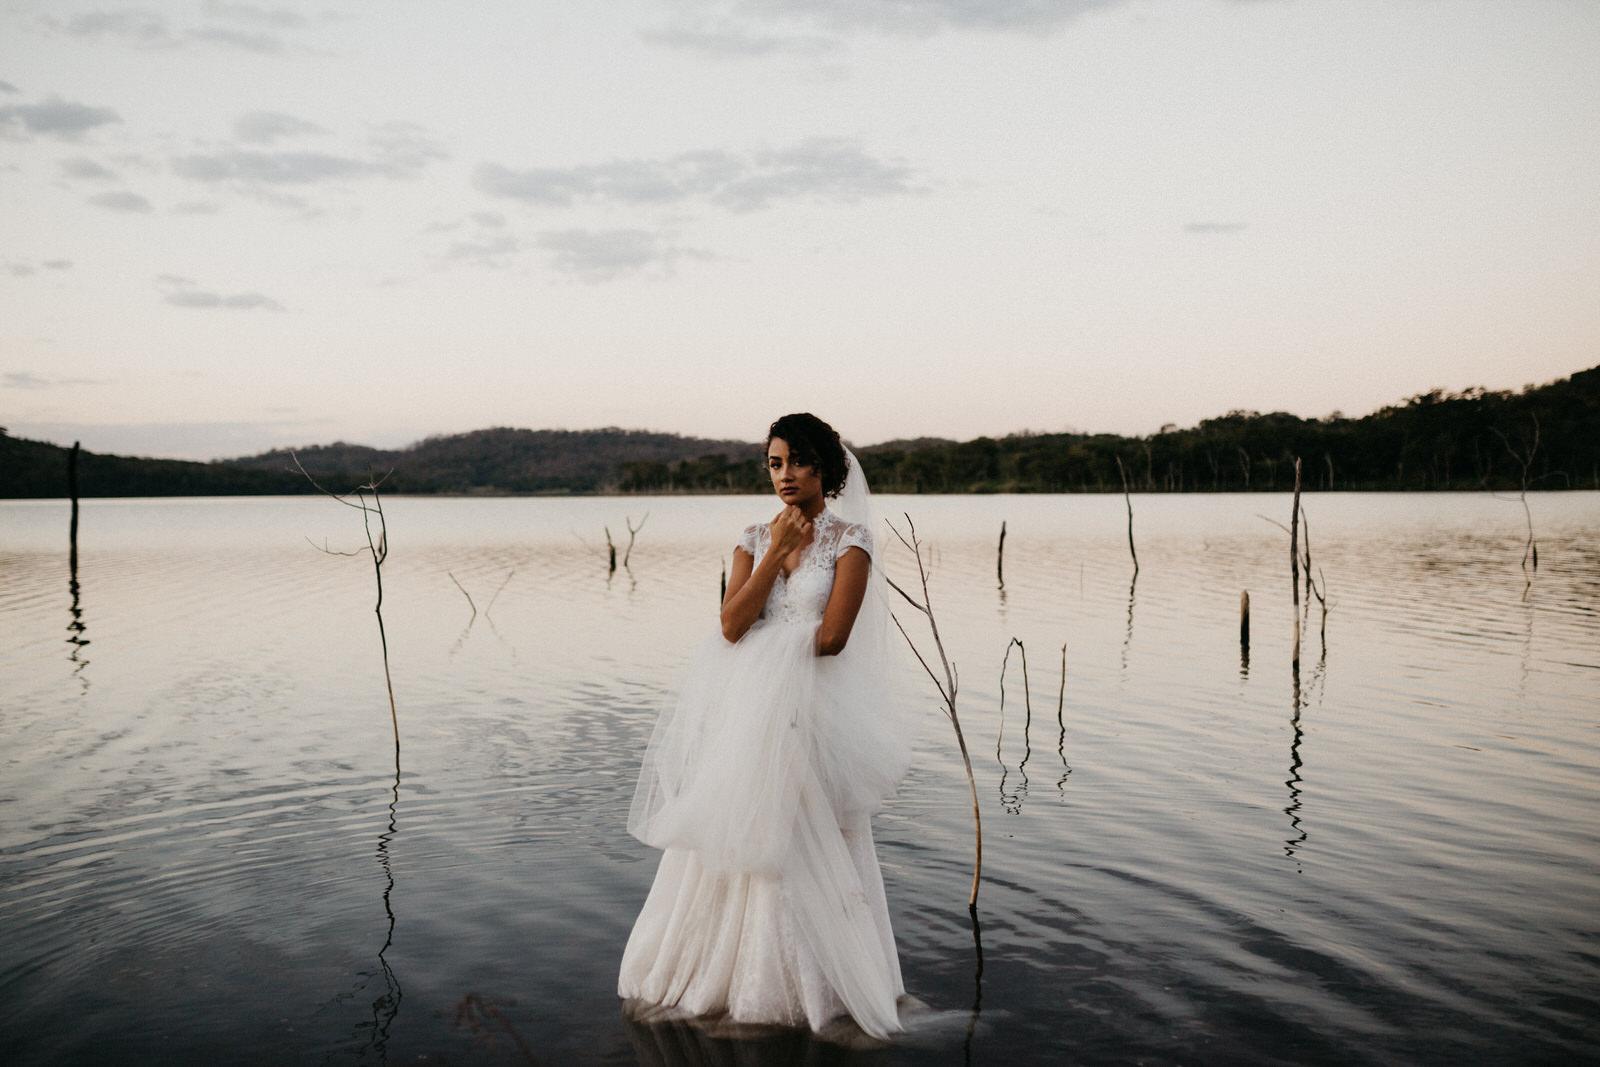 Céu_fotografia_casamentos_goiás_brasil_folk_noivas_brides_alternativo (71).jpg